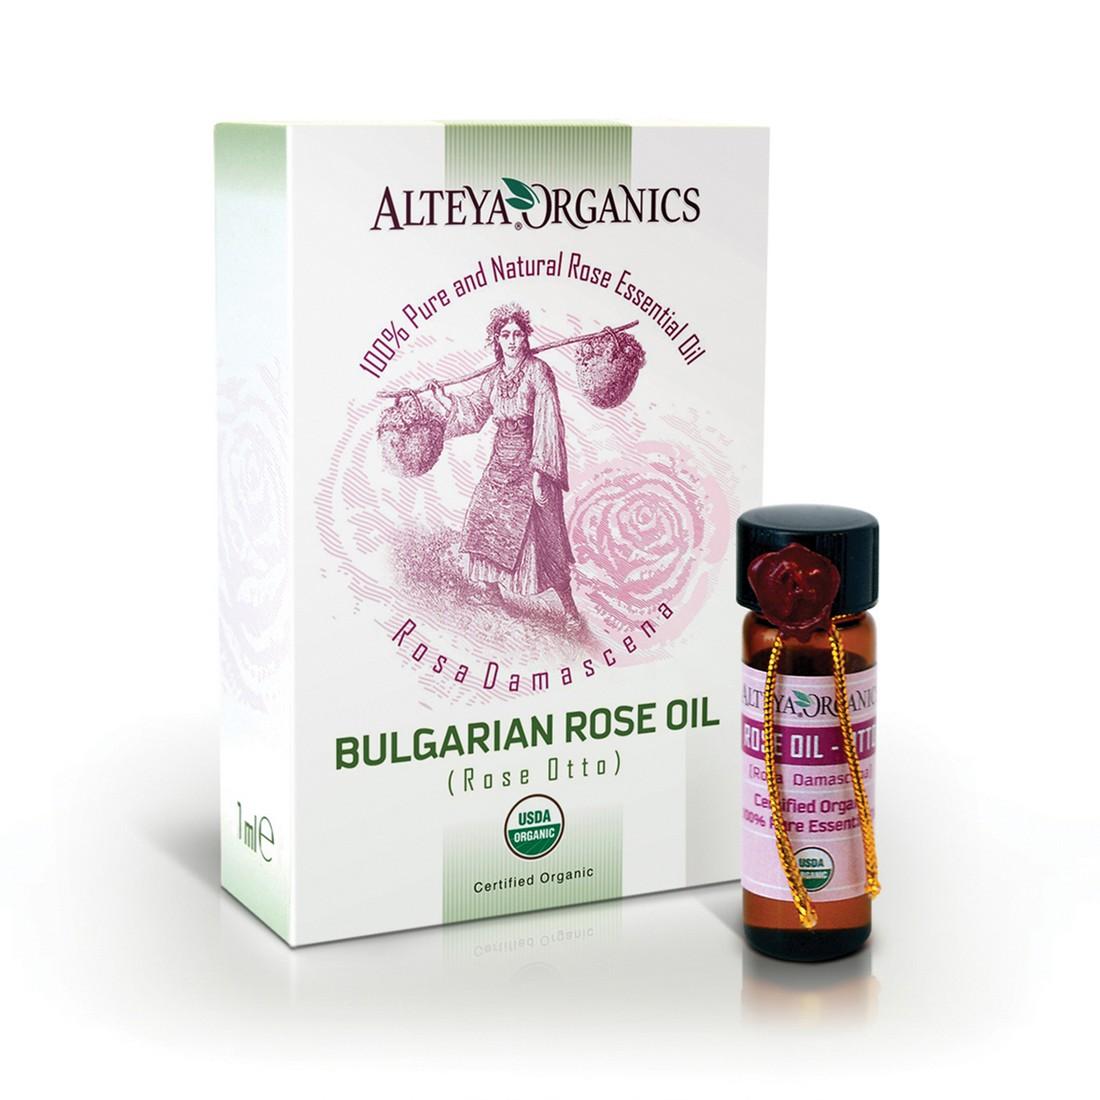 Био органично българско розово масло Alteya Organics